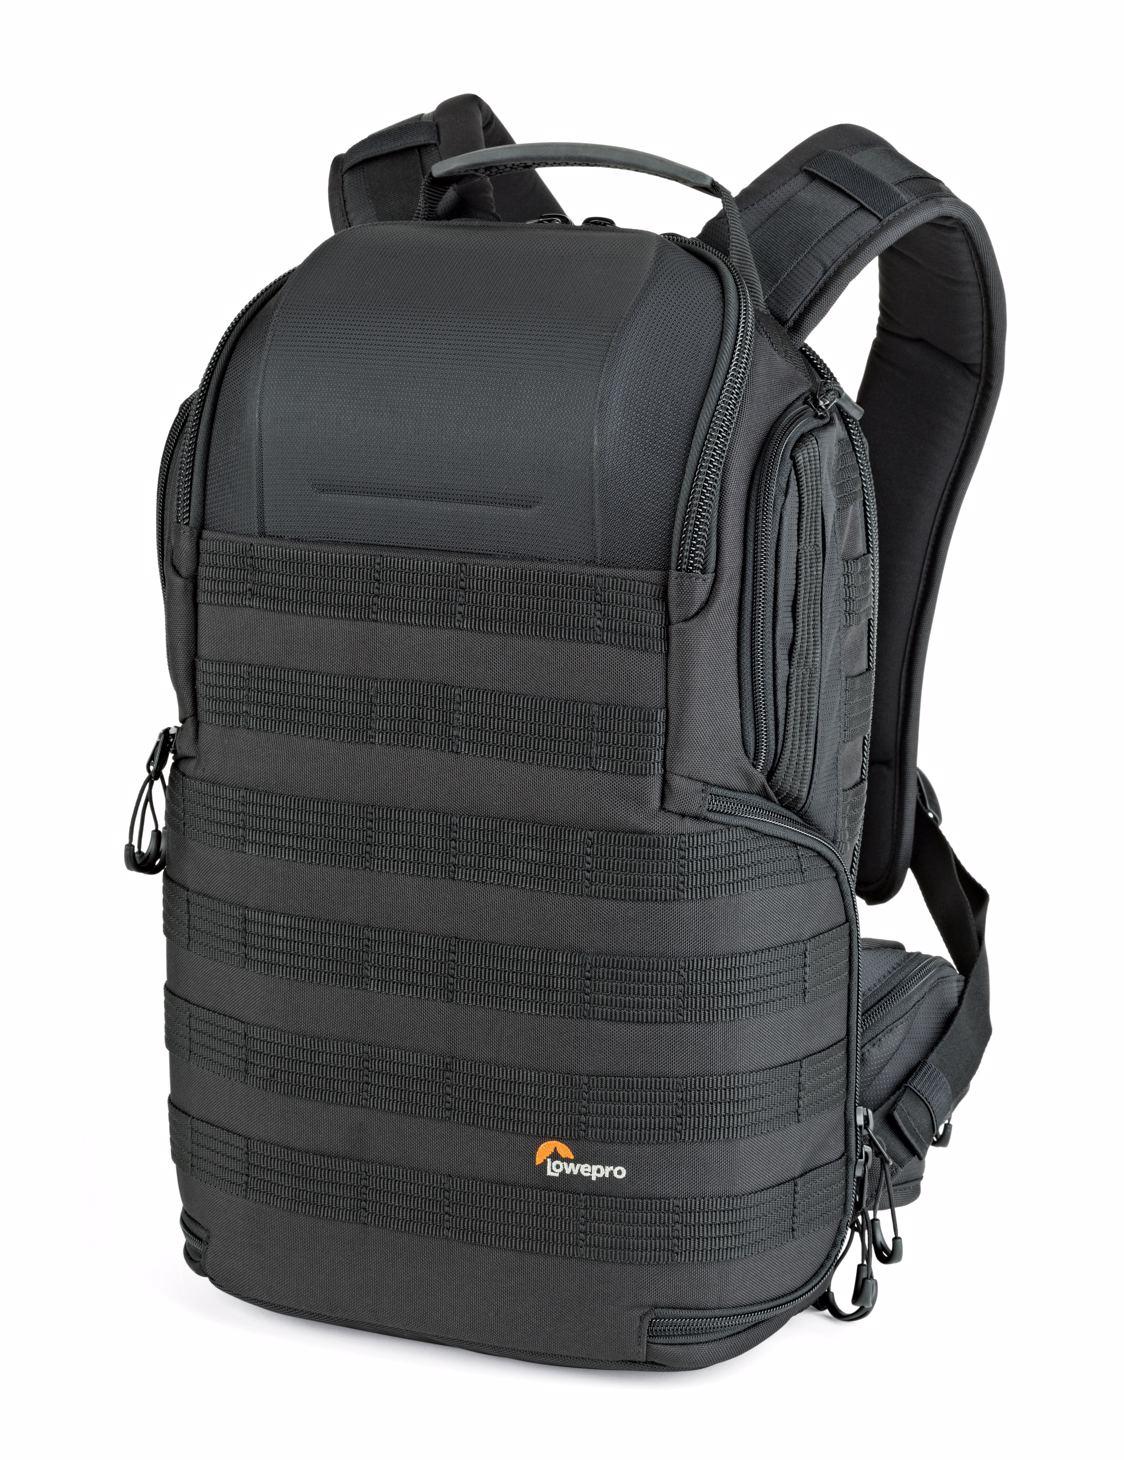 Lowepro ProTactic BP 450 AW II